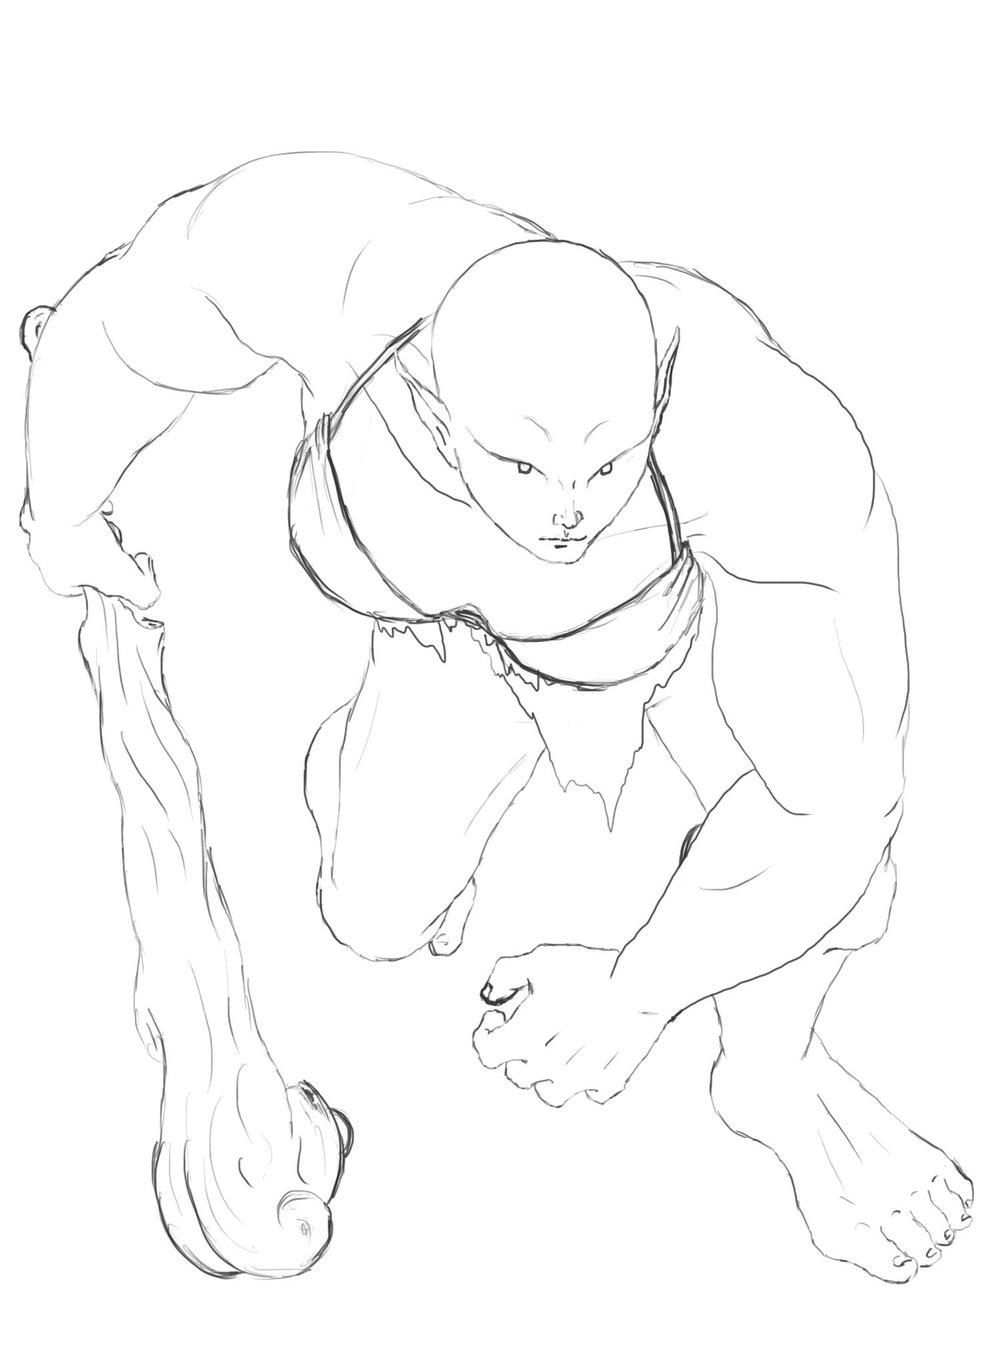 Ogress 2.jpg